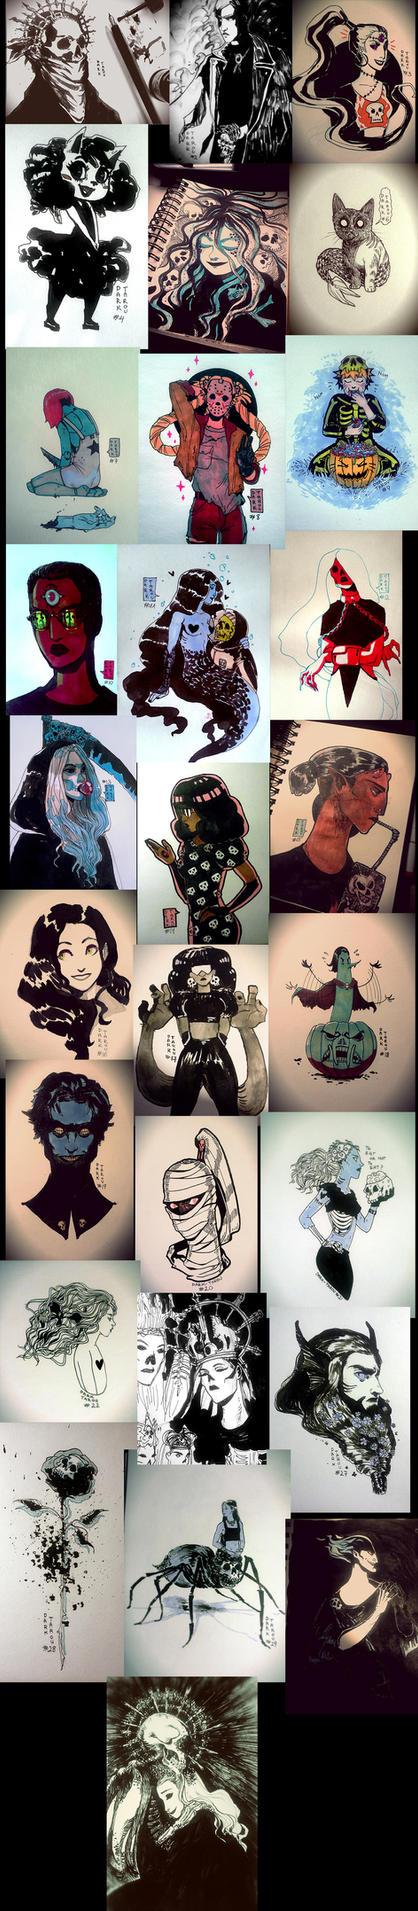 Inktober Art compilation by dark-tarou